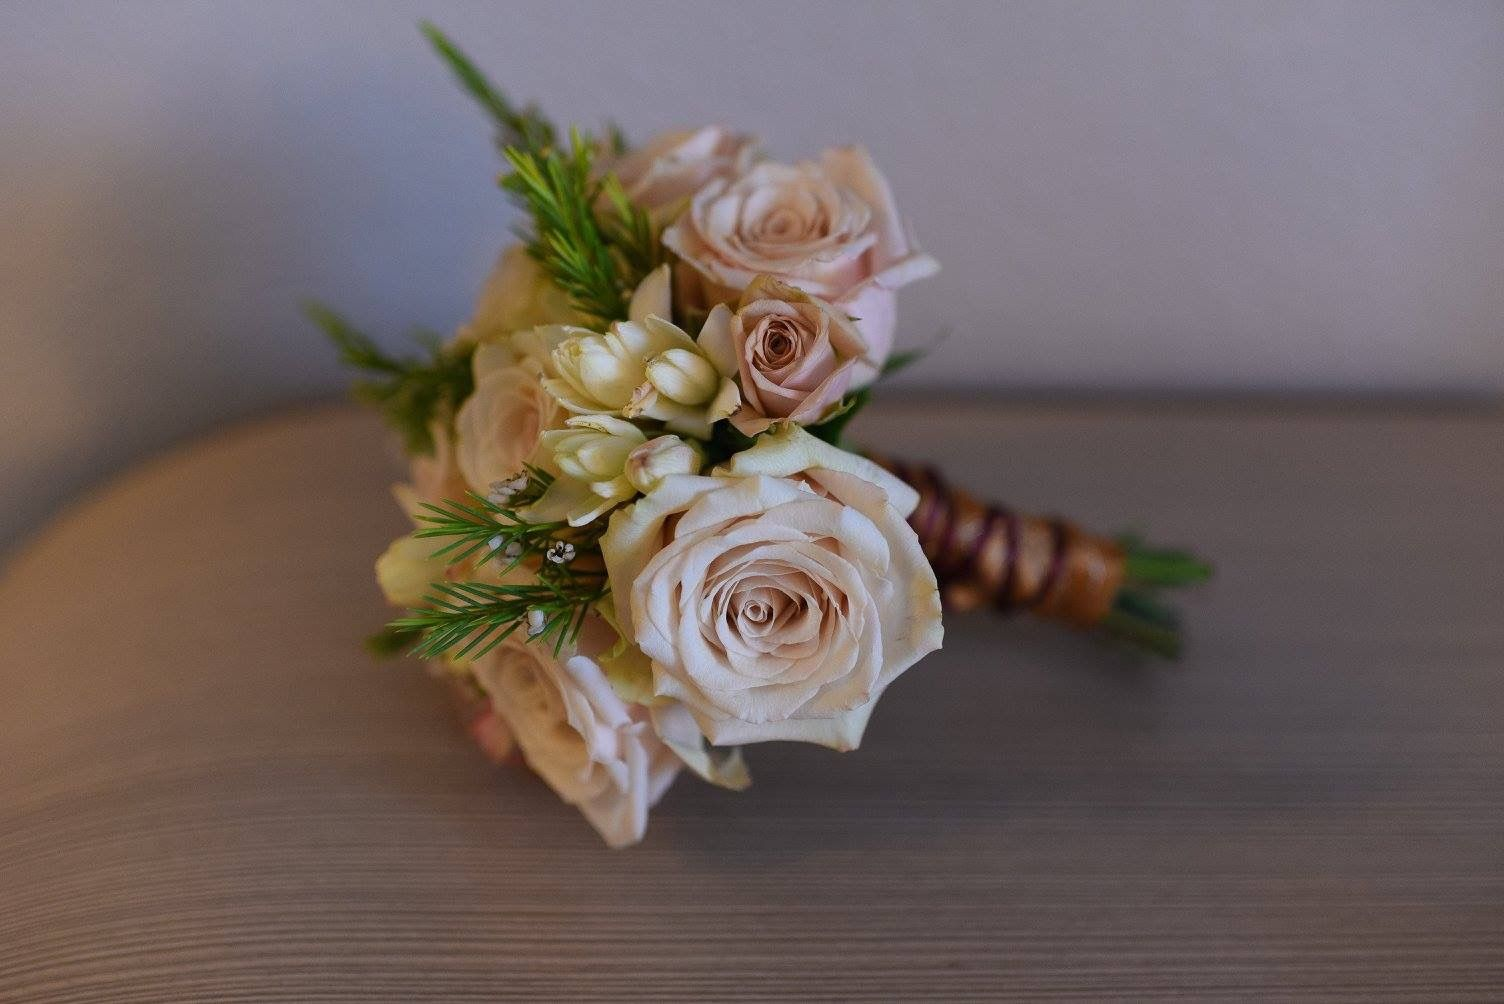 Cream and gold wedding bouquet